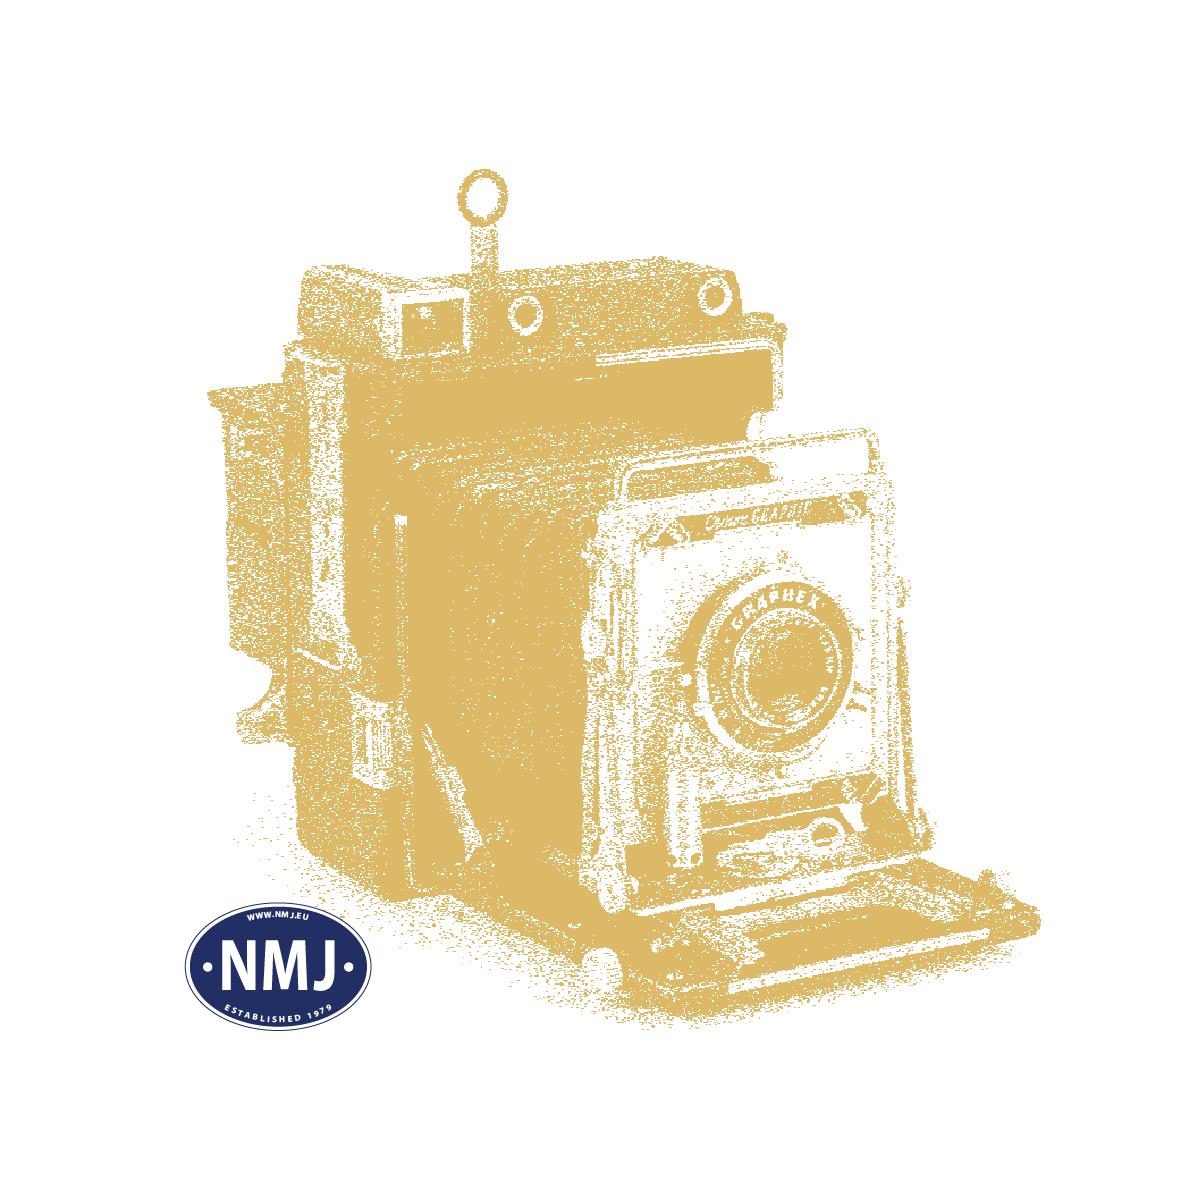 NMJ0.21506 - NMJ Superline NSB BF10.21506, 0-Skale